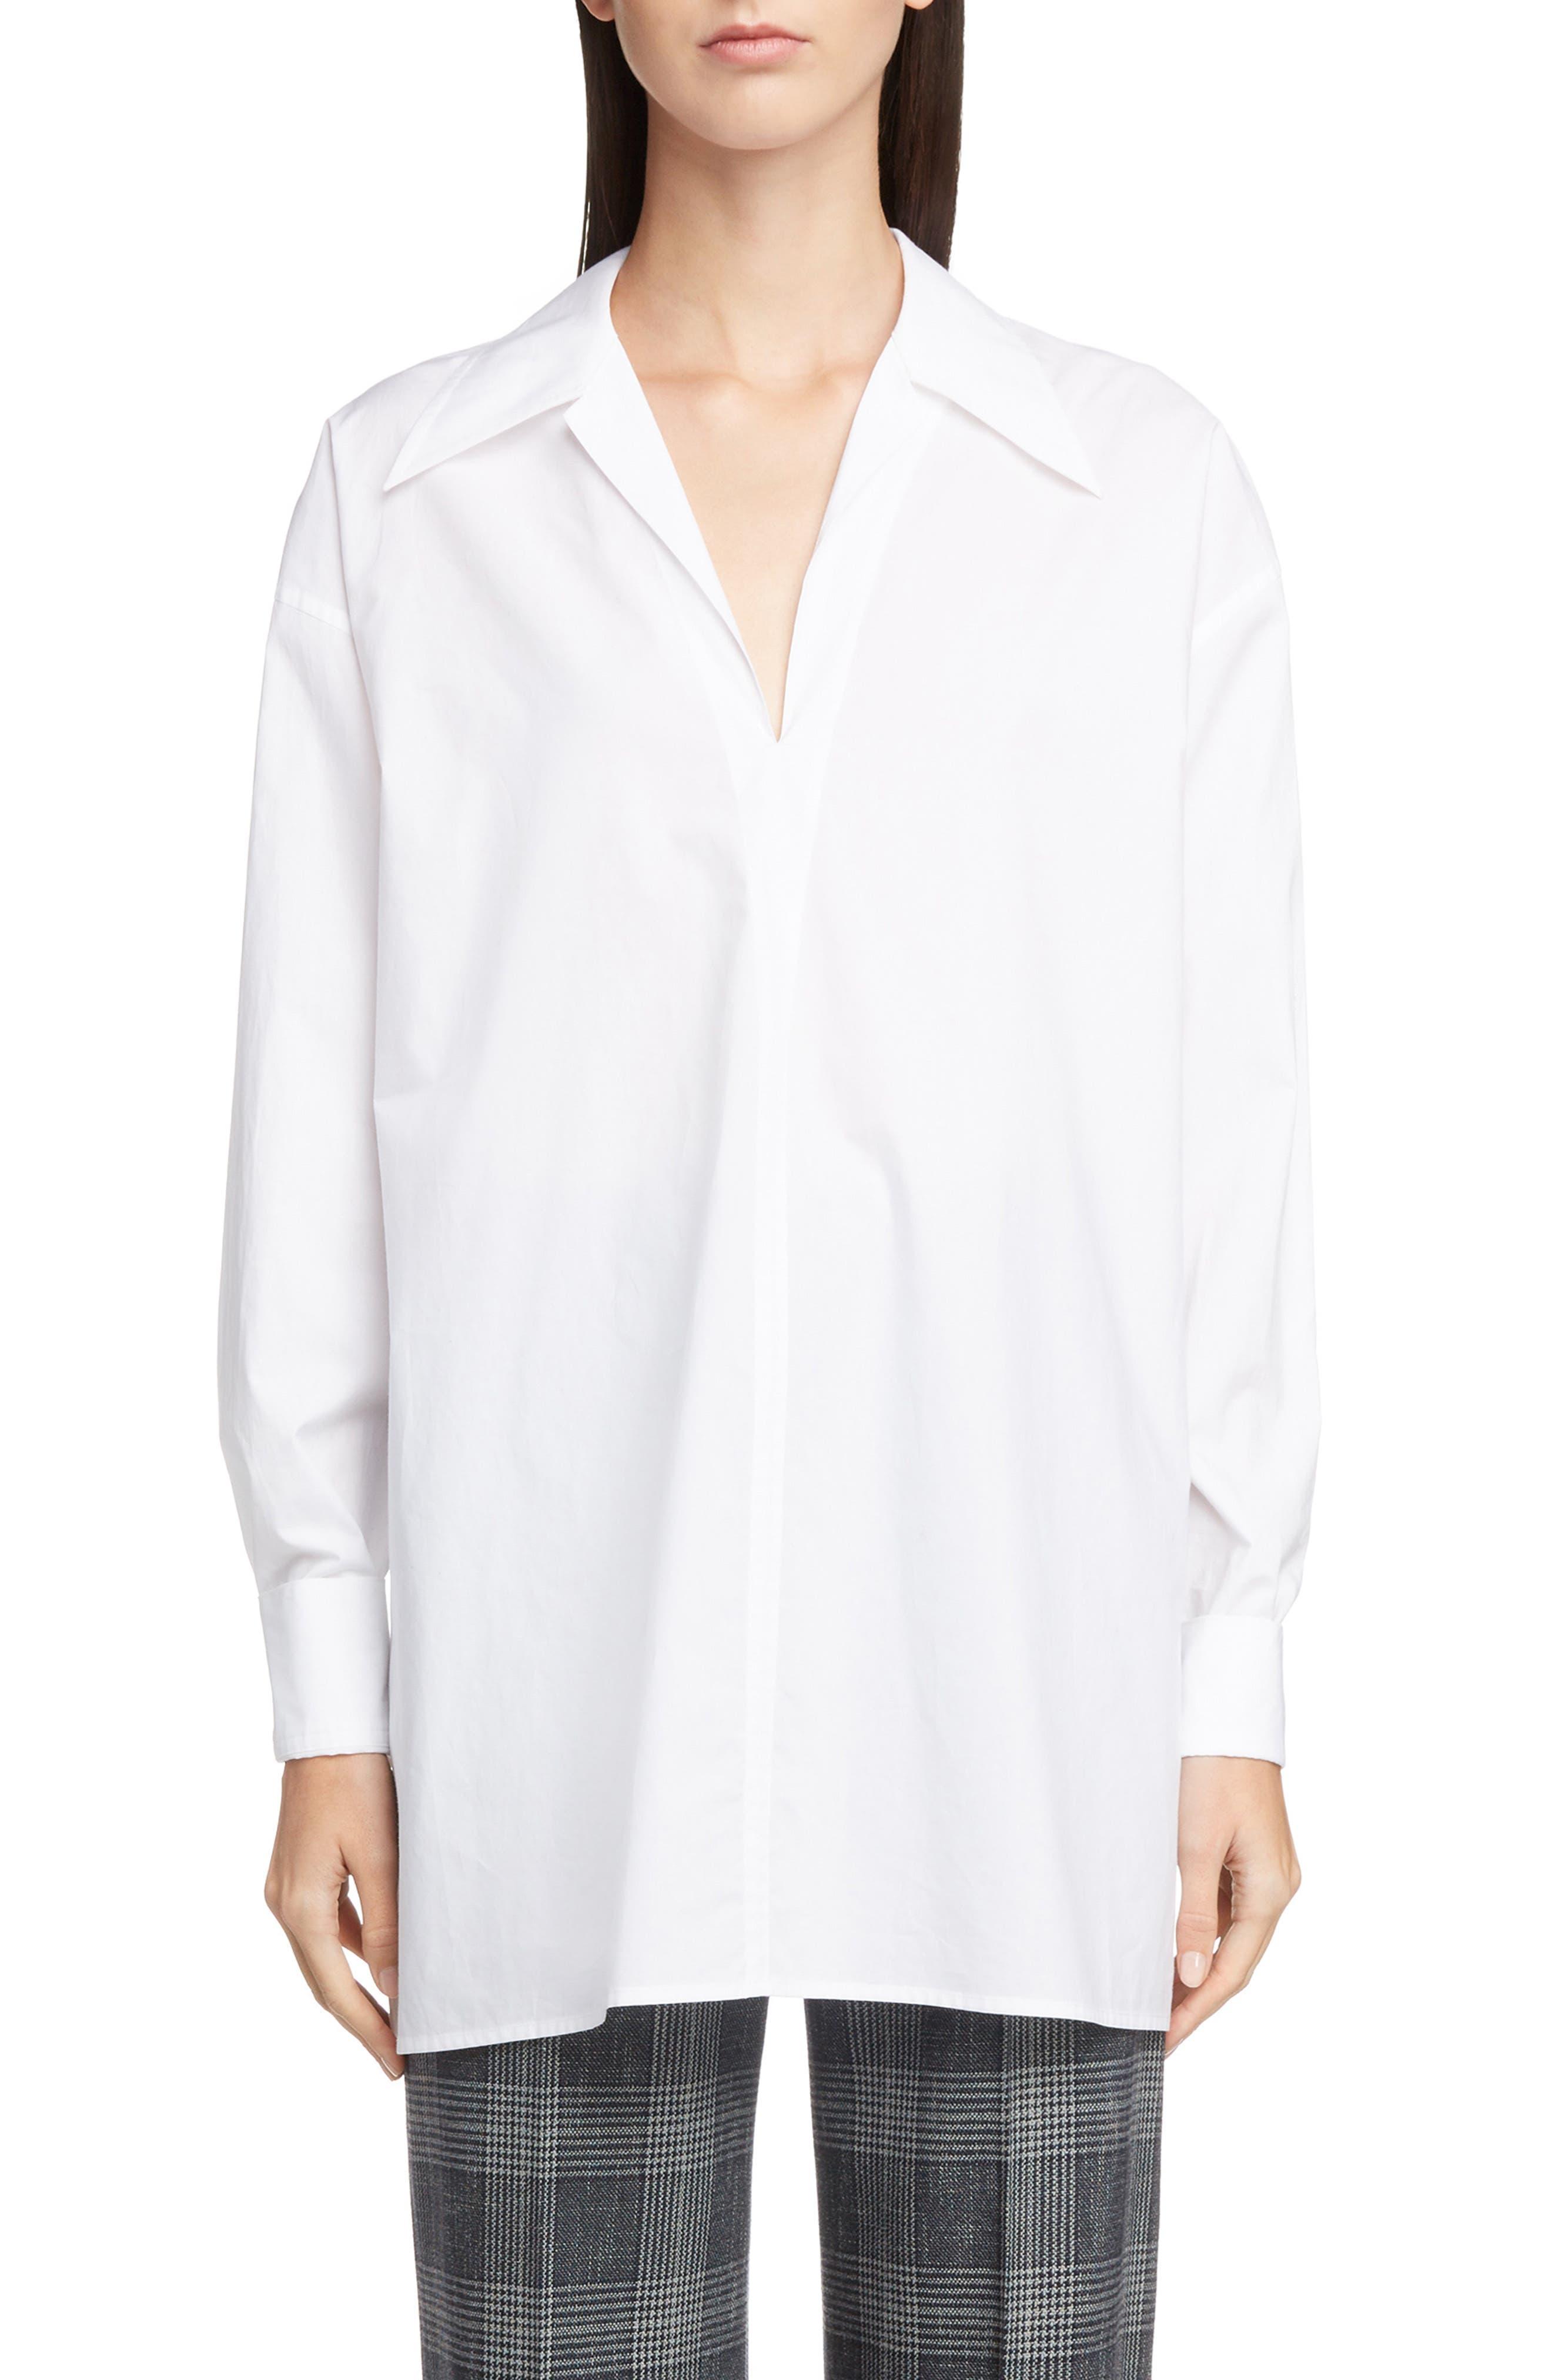 ACNE STUDIOS,                             Spread Collar Shirt,                             Main thumbnail 1, color,                             WHITE